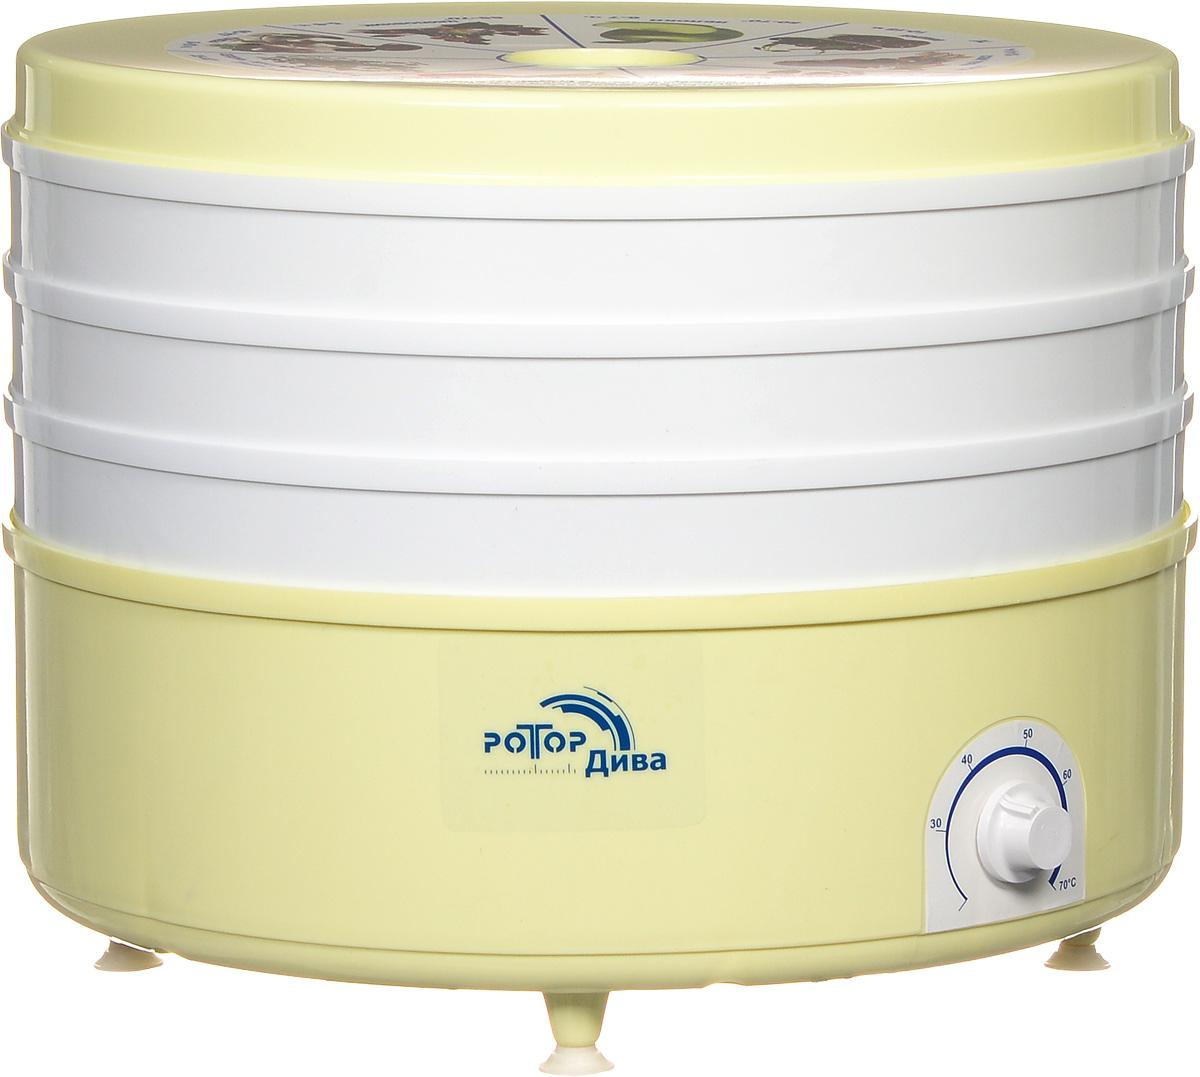 Сушилка для овощей и фруктов Ротор Дива СШ-007-05 white/yellow